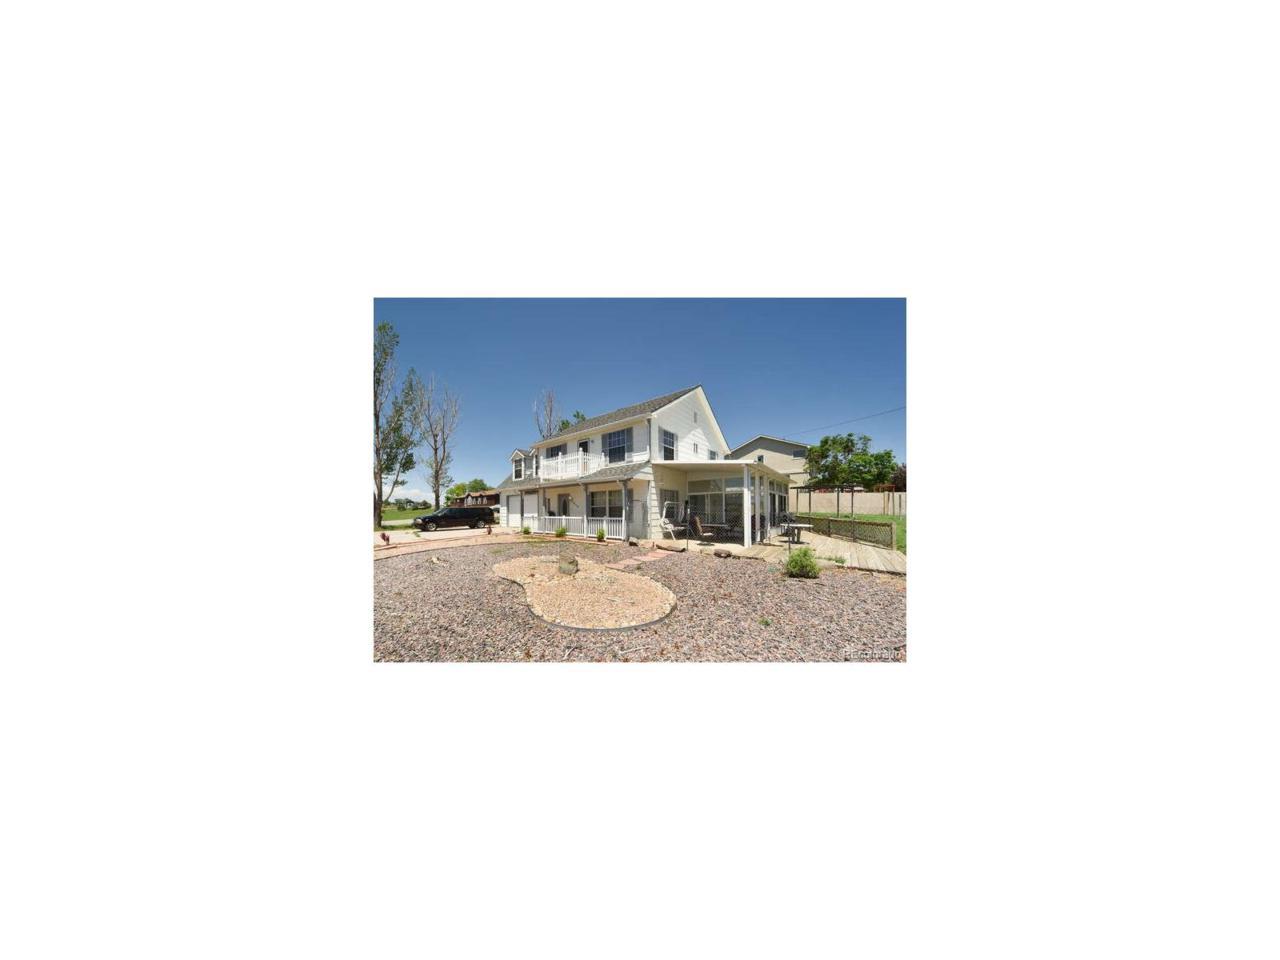 580 S Pine, Keenesburg, CO 80643 (MLS #7997435) :: 8z Real Estate